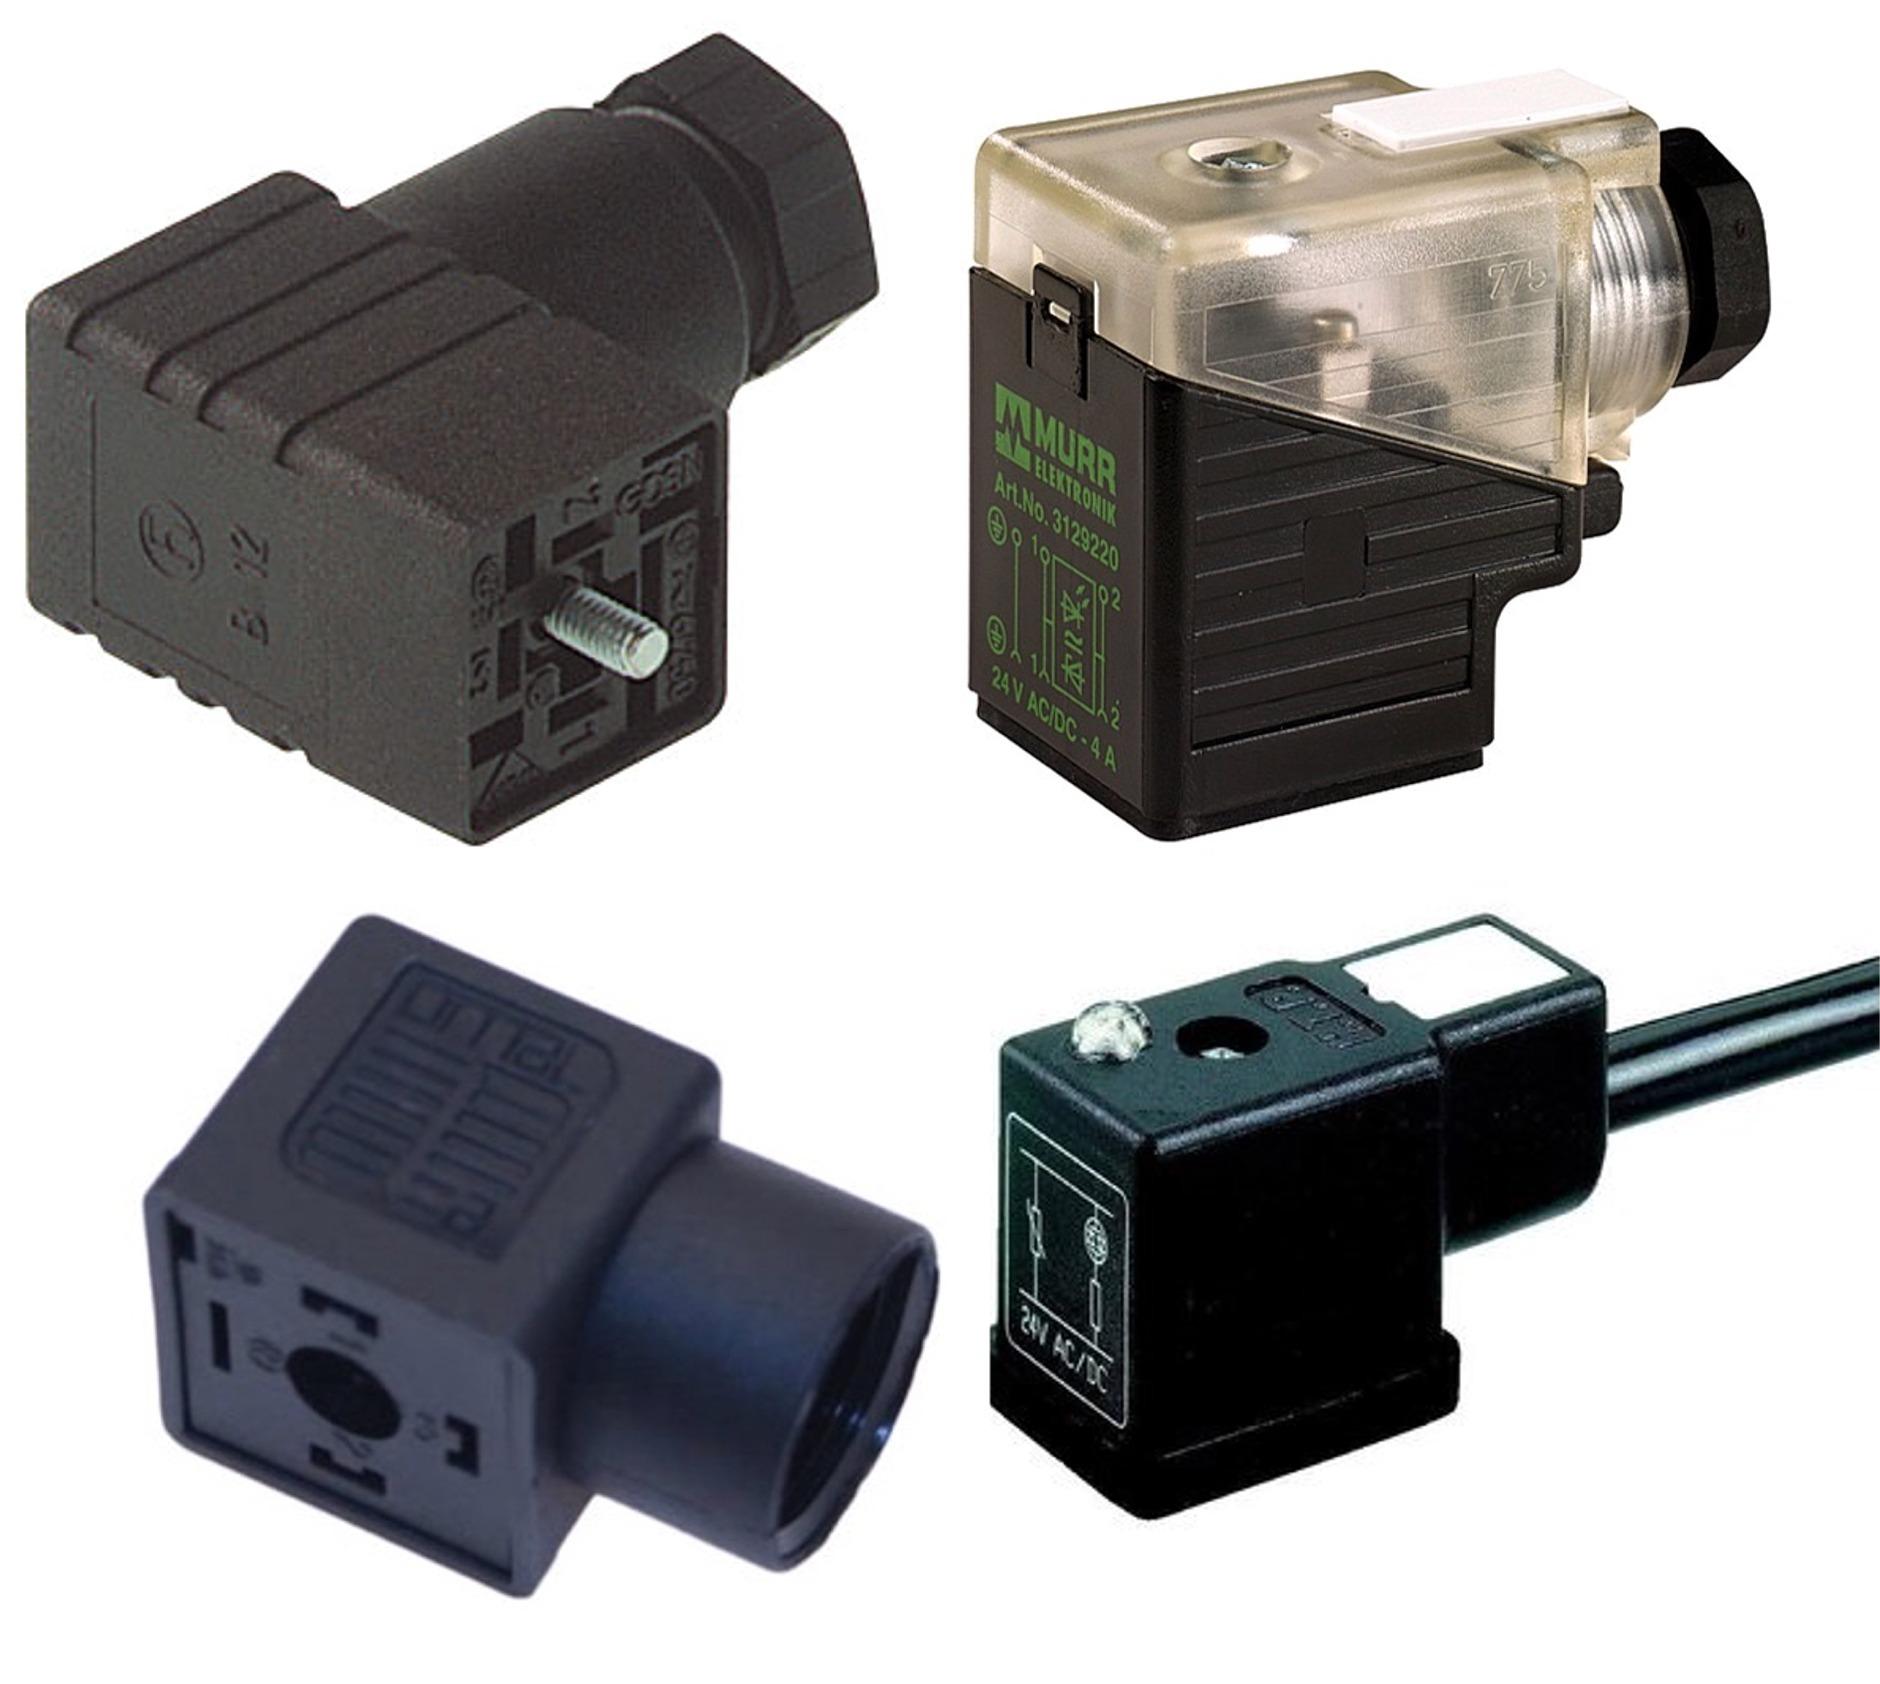 43650a Din Connector Wiring 12 Volt Free Vehicle Diagrams Connectors 43650 Solenoid Valve Rh Productsforautomation Com Marine Automotive